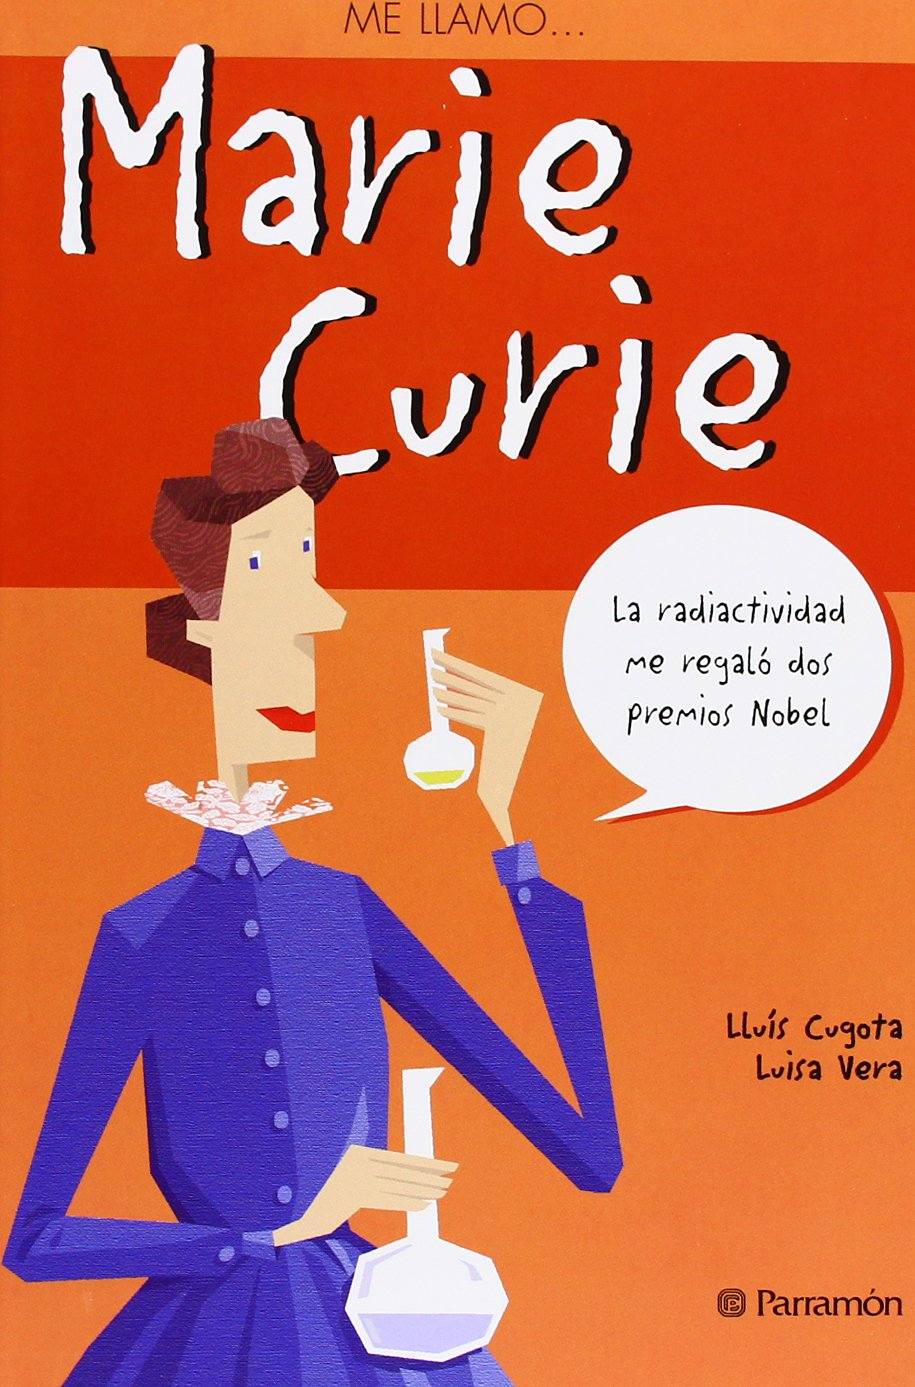 ME LLAMO MARIE CURIE (Spanish Edition) (Me llamo / My name is) (Spanish) Paperback – January 5, 2011